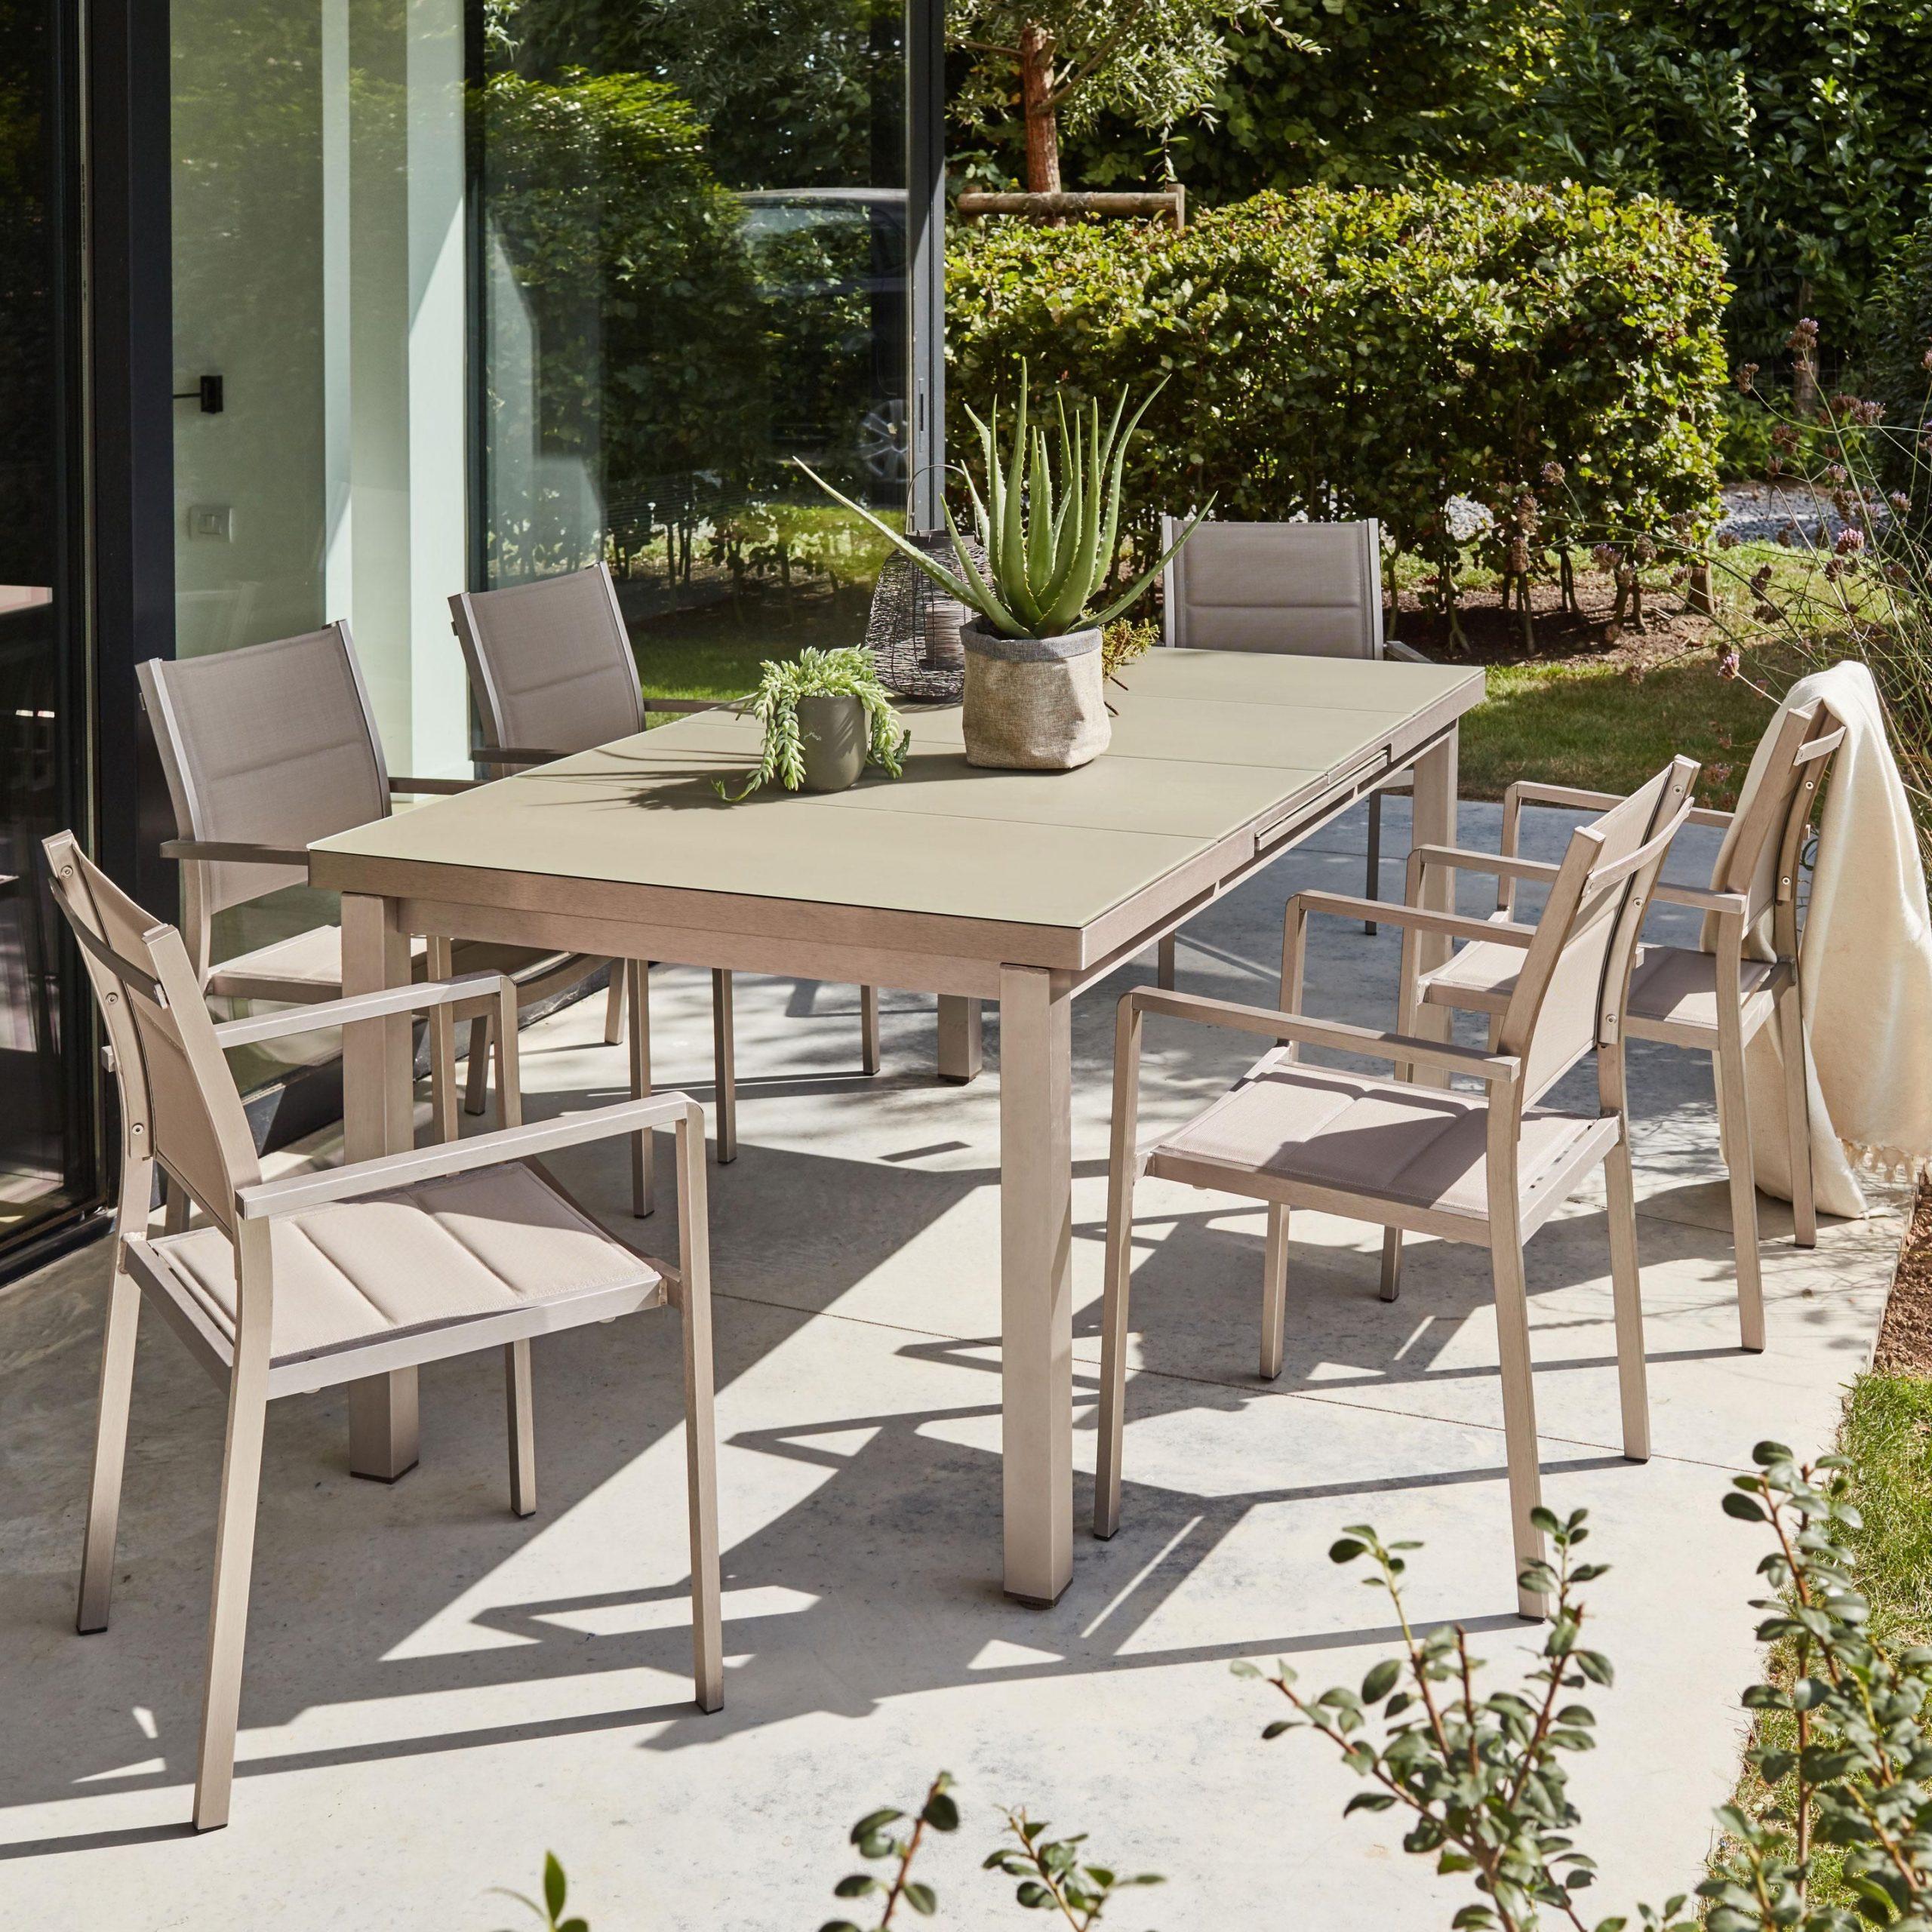 Table De Jardin De Repas Niagara Rectangulaire Marron 10 ... pour Housse Table De Jardin Leroy Merlin